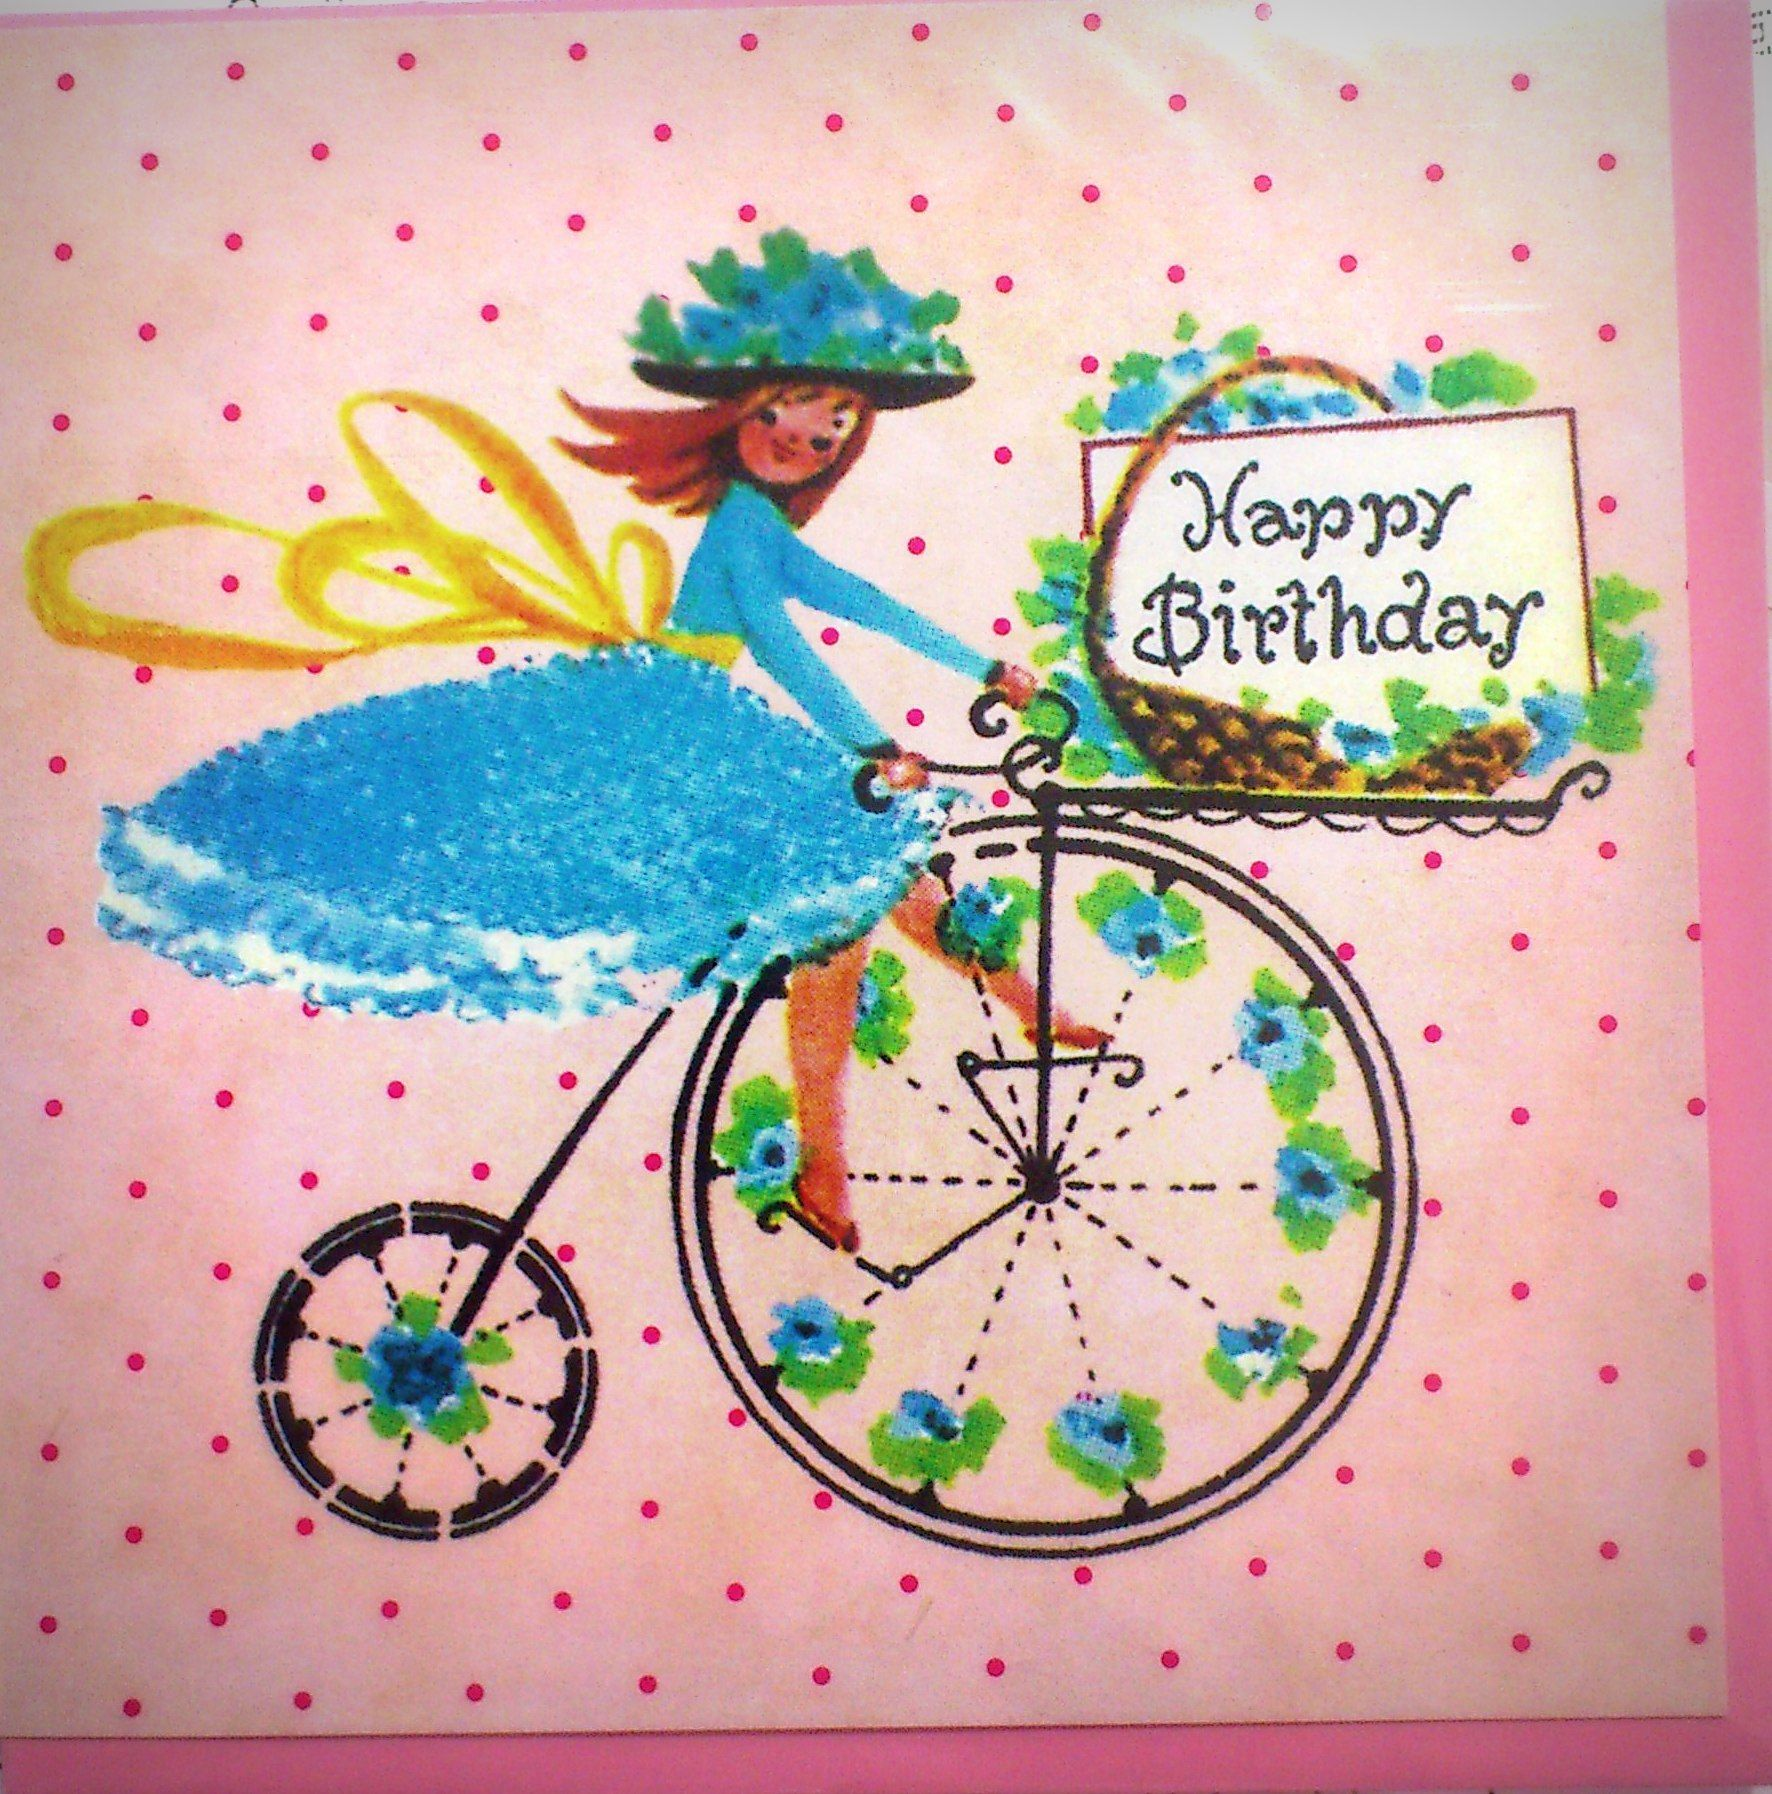 Happy Birthday Penny Farthing Card At Rua Dublin